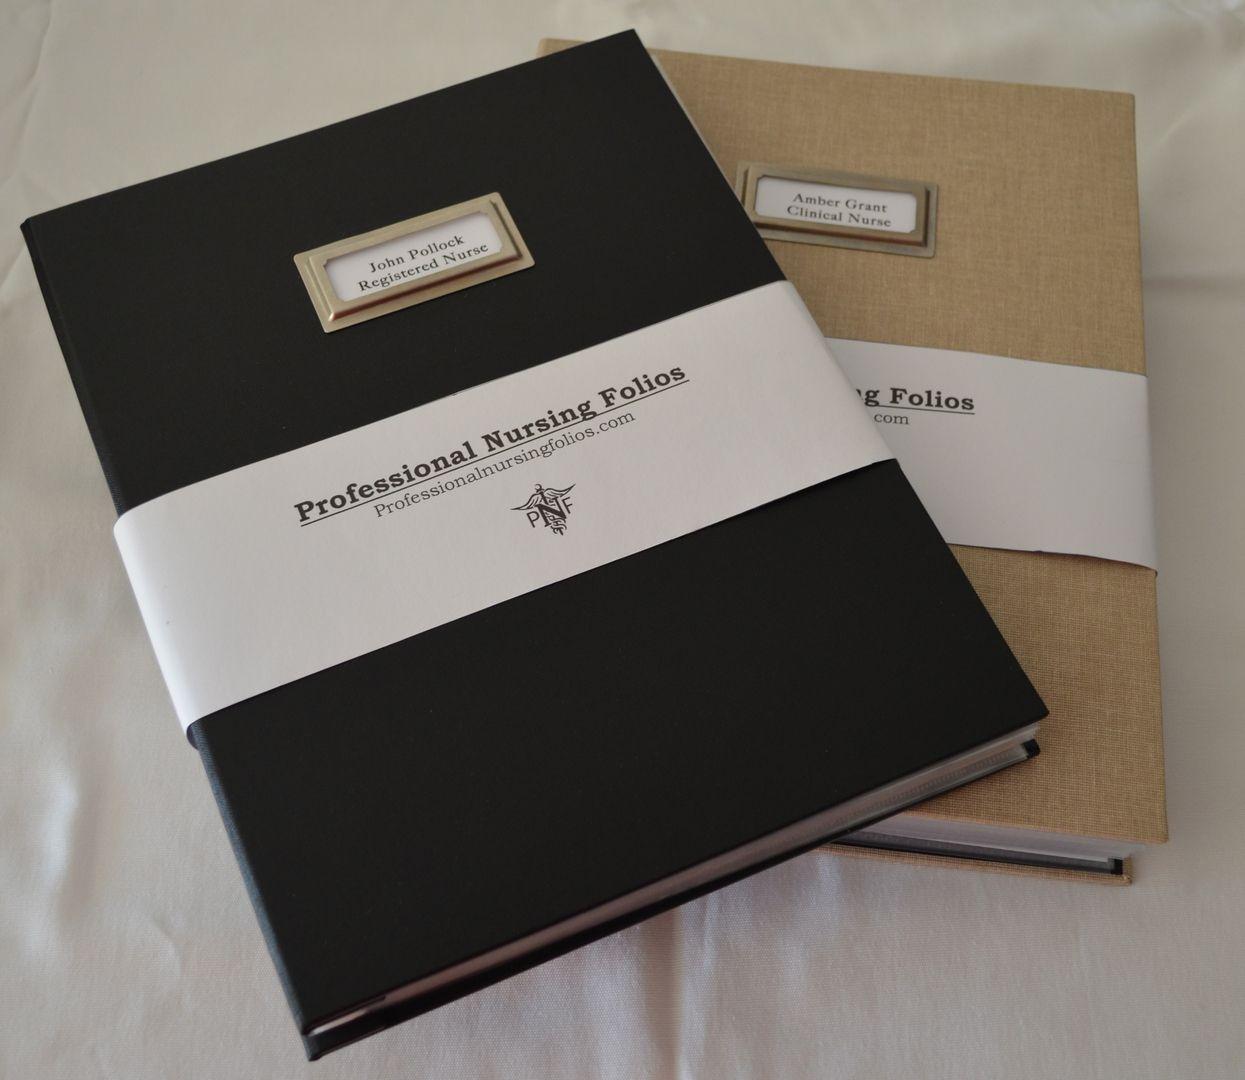 Professional Nursing Folios Professional Nursing